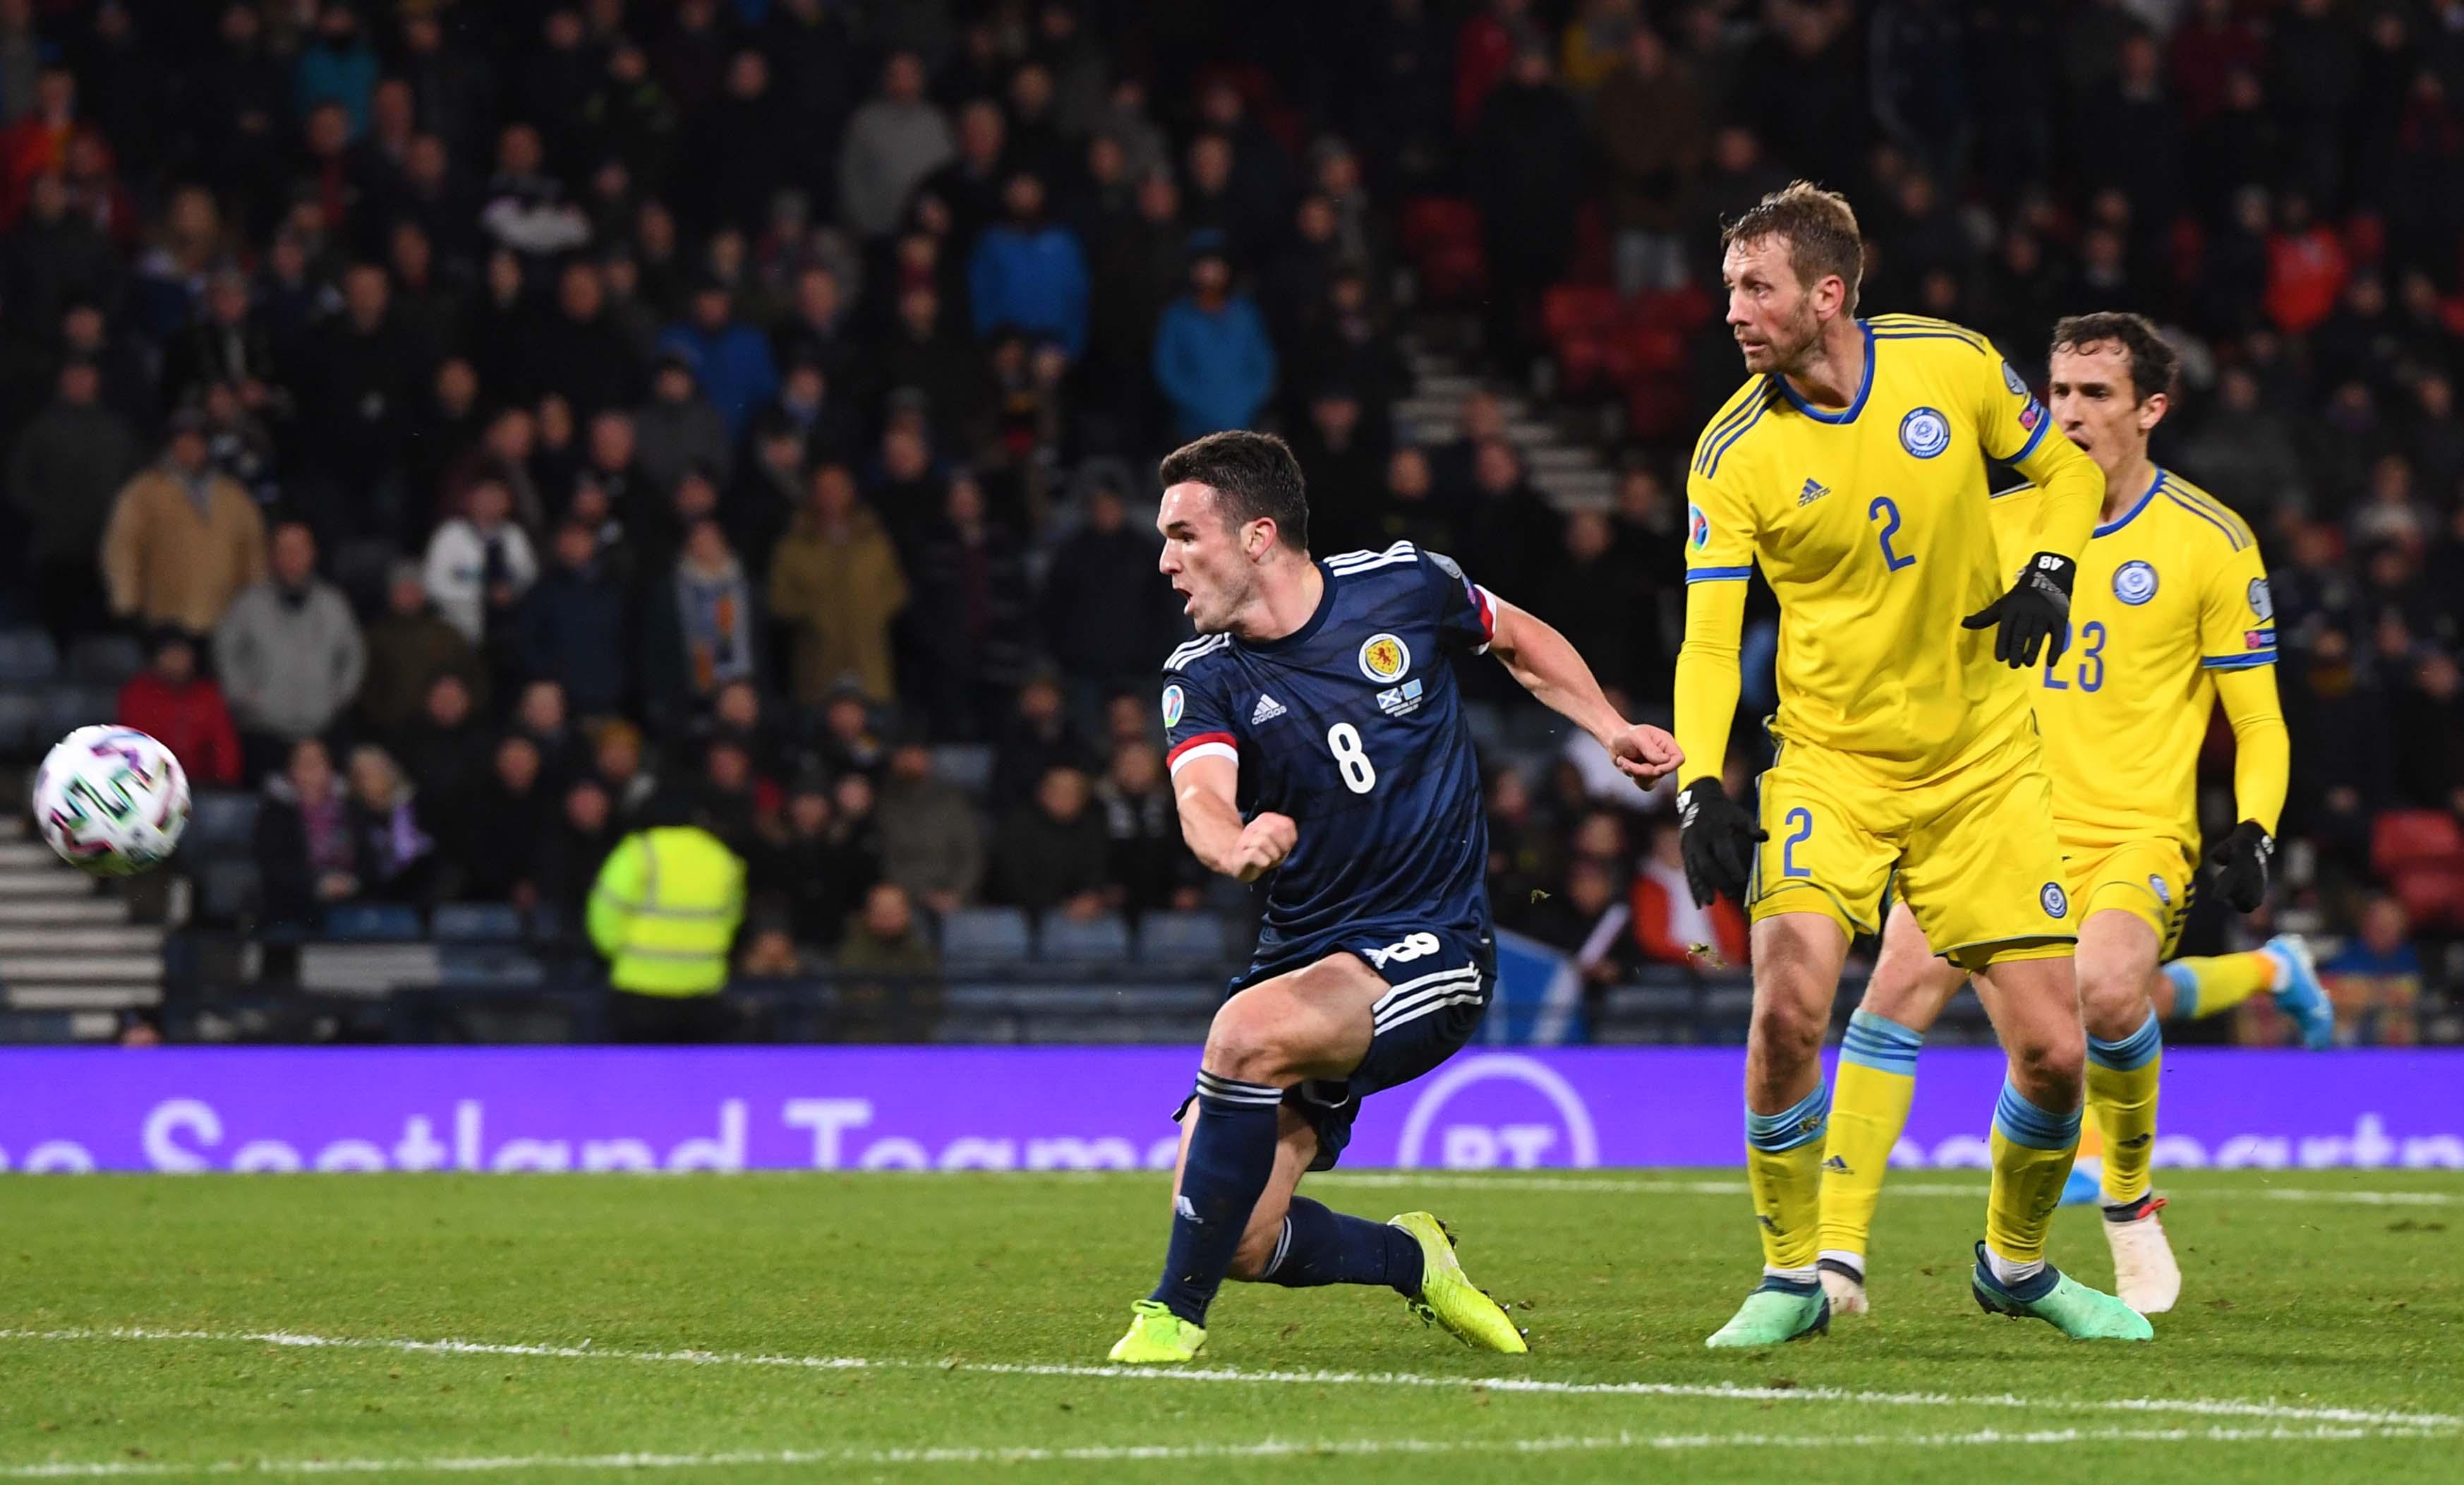 John McGinn makes it 3-1 during the UEFA European Championship Qualifier between Scotland and Kazakhstan at Hampden Park.